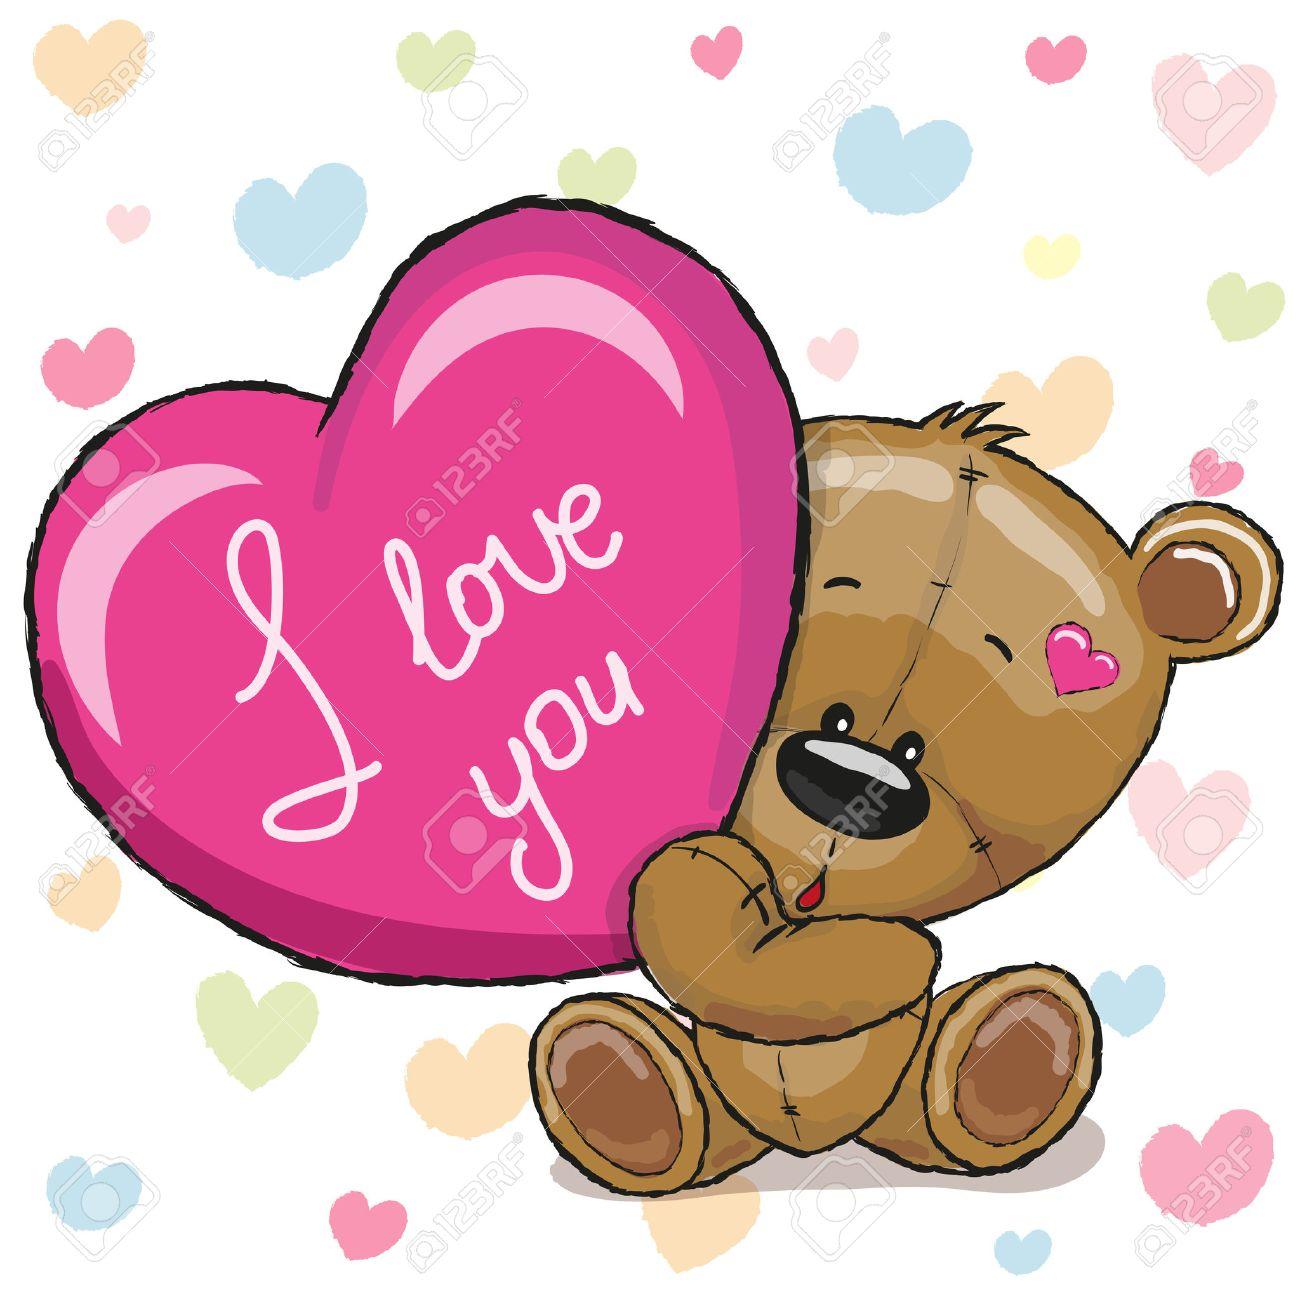 Cute Teddy Bear with heart on a hearts background - 51845080